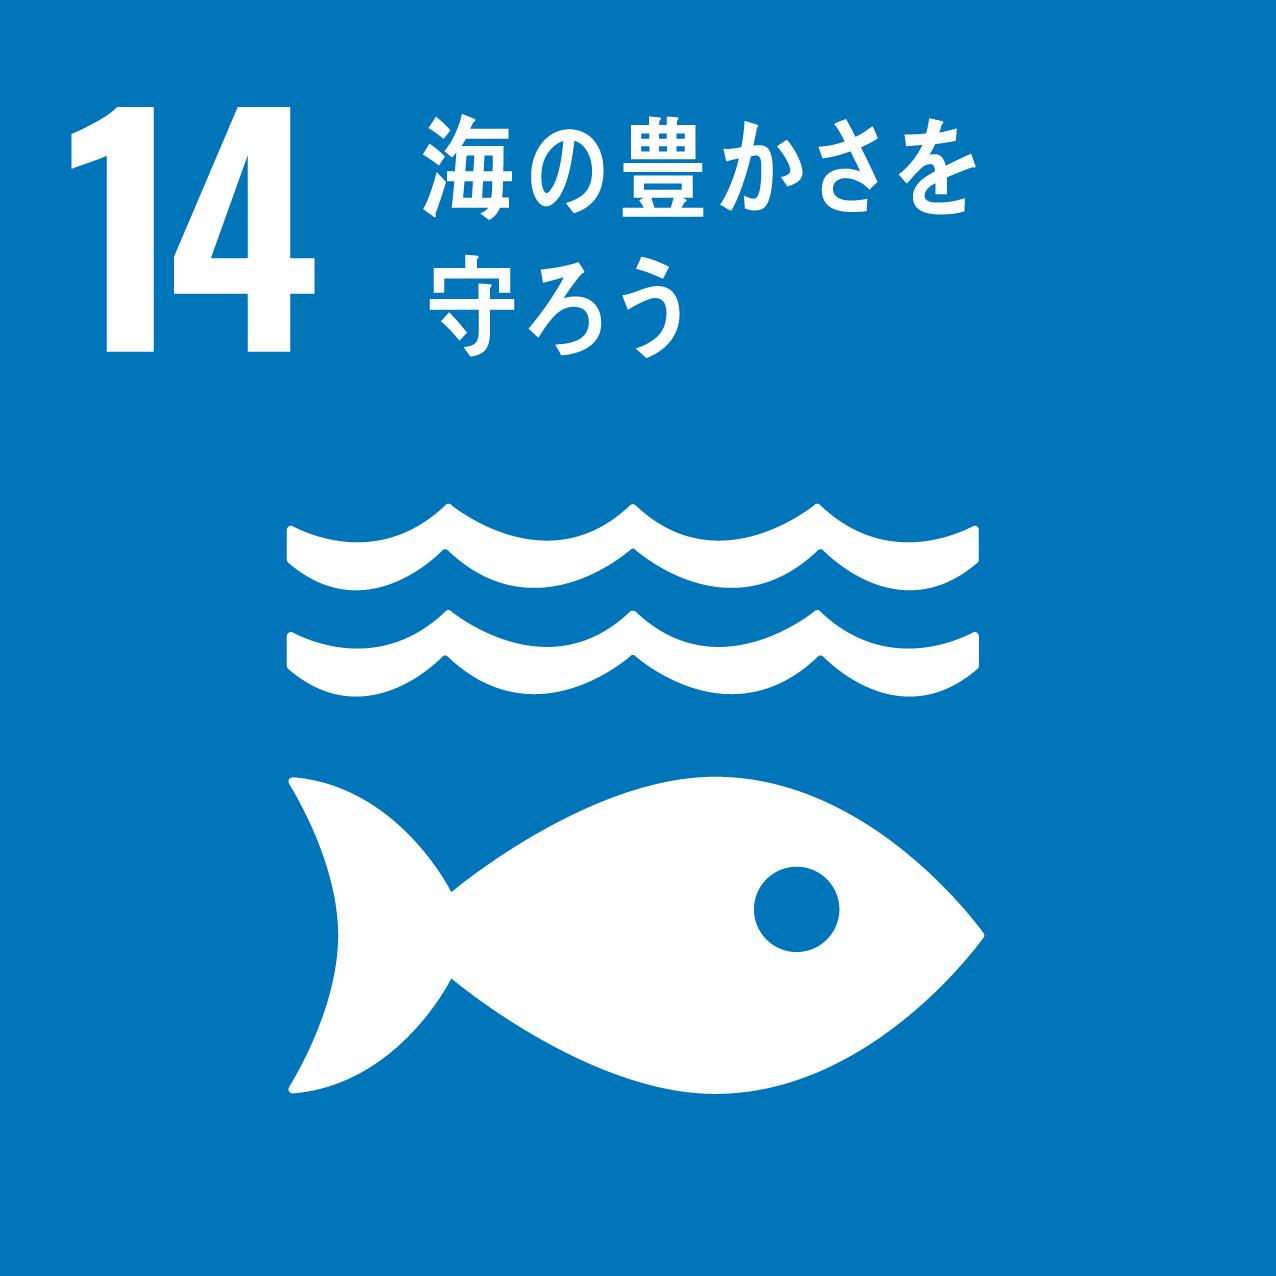 SDGs 14.海の豊かさを守ろう